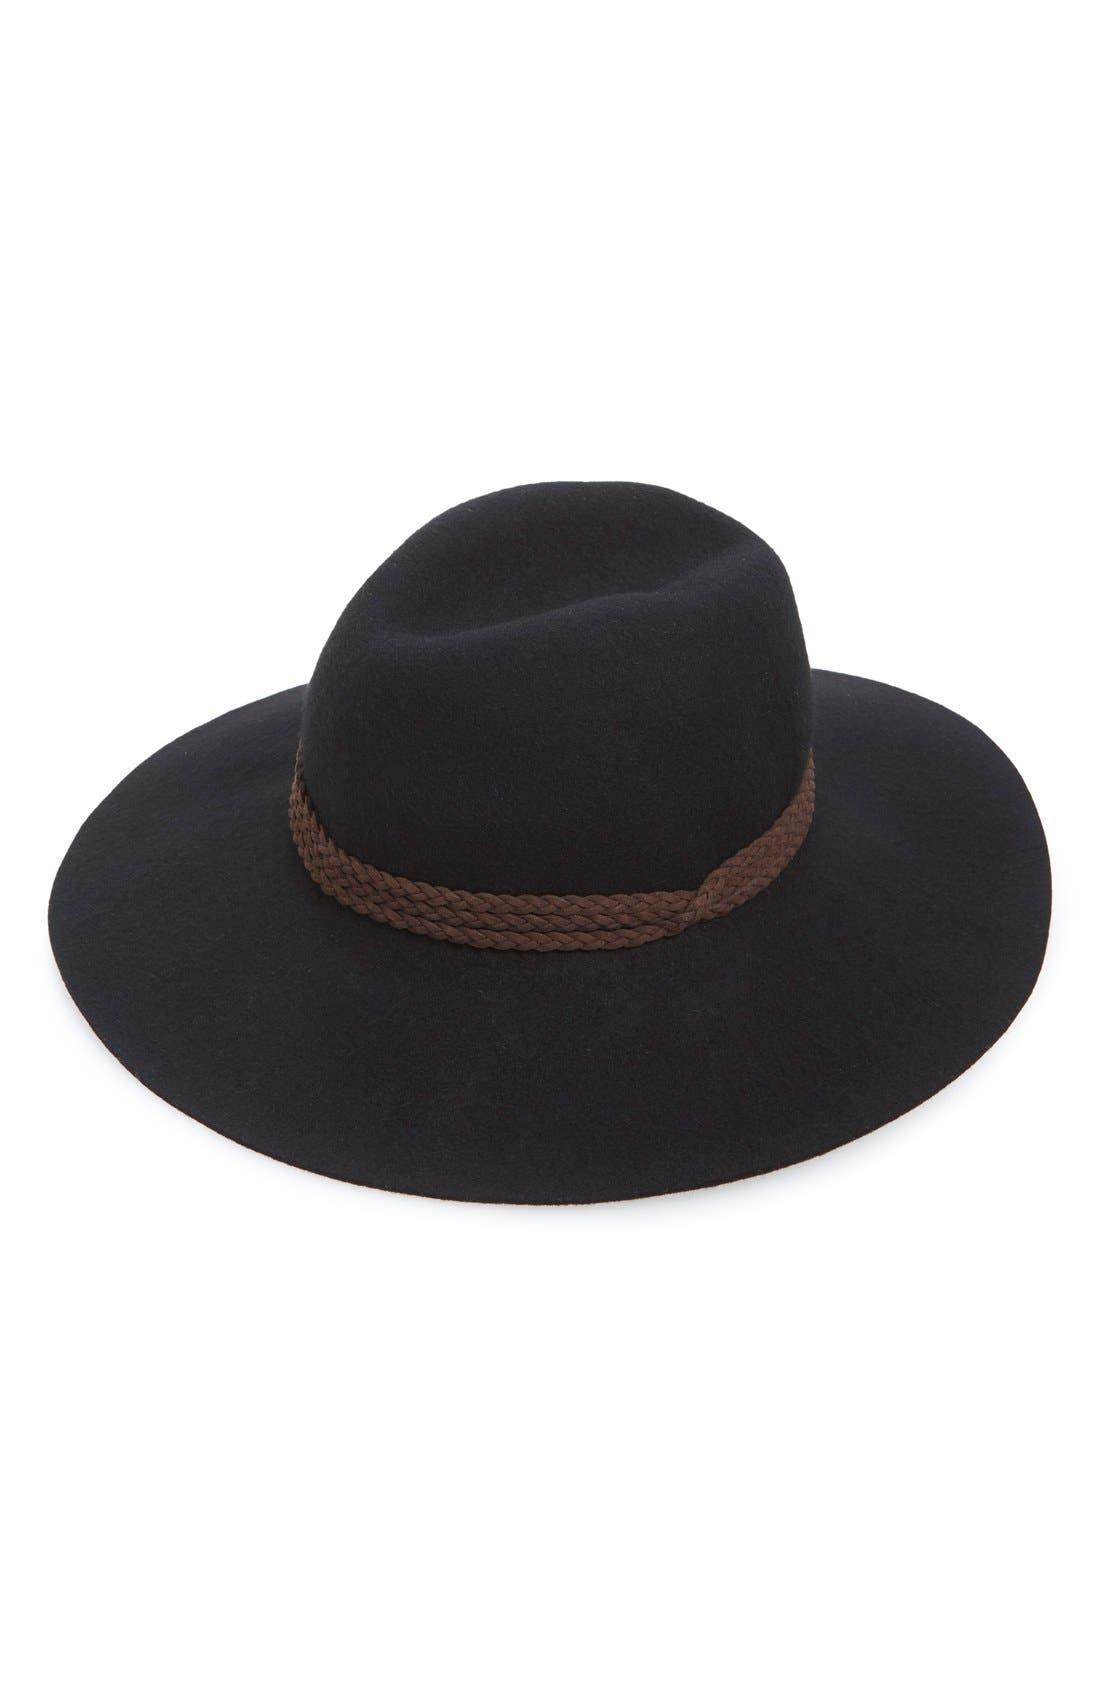 Floppy Wool Panama Hat,                             Main thumbnail 1, color,                             001